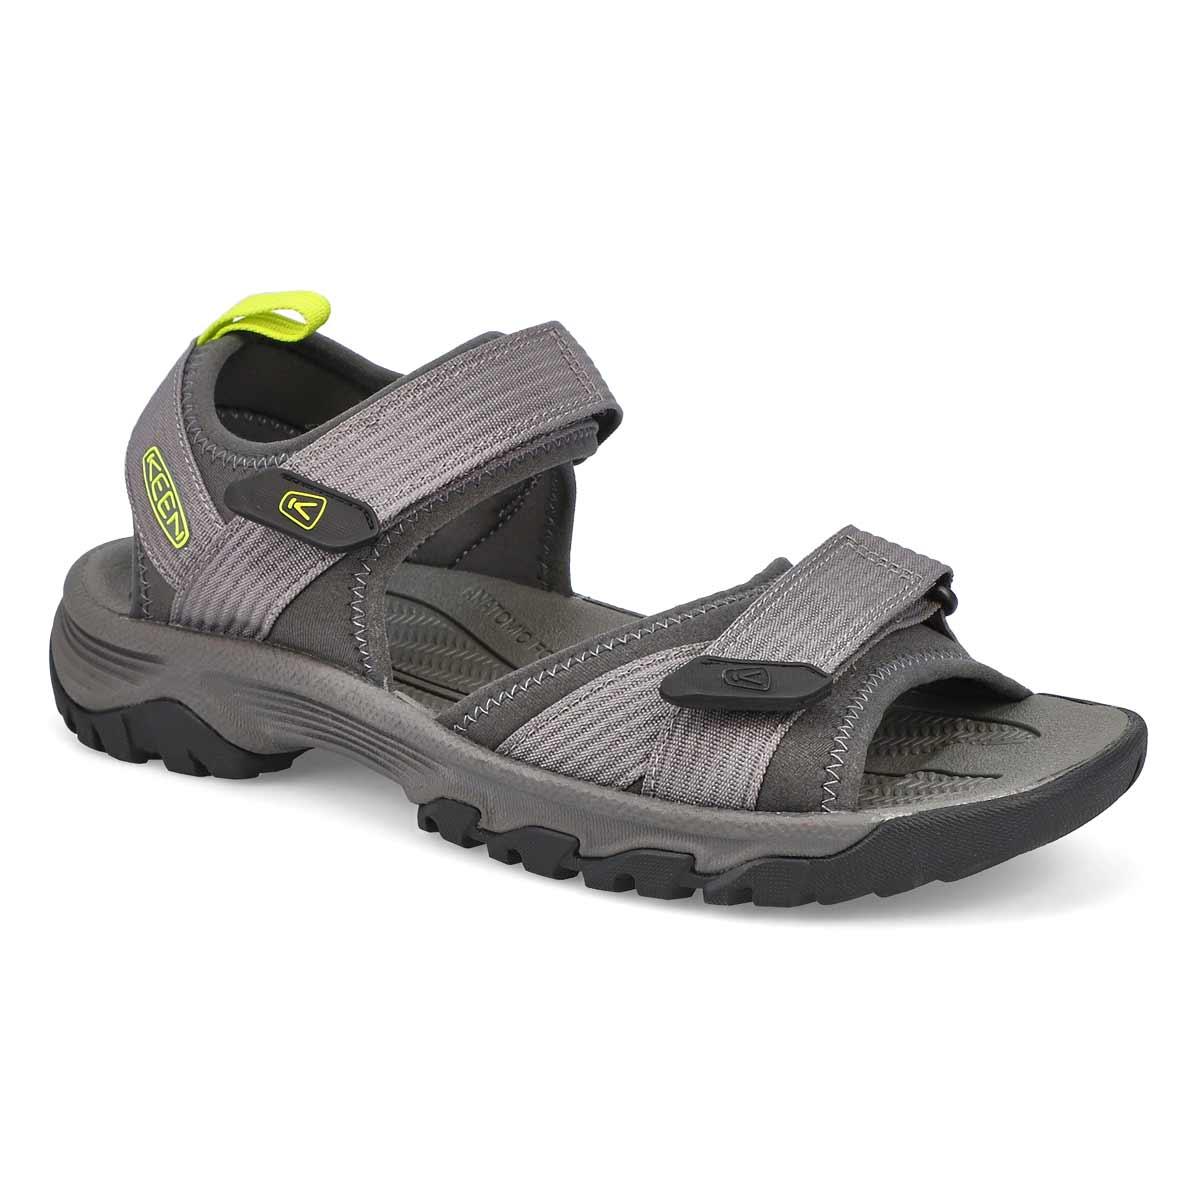 Sandale Targhee III Open Toe H2,gris/vert hommes